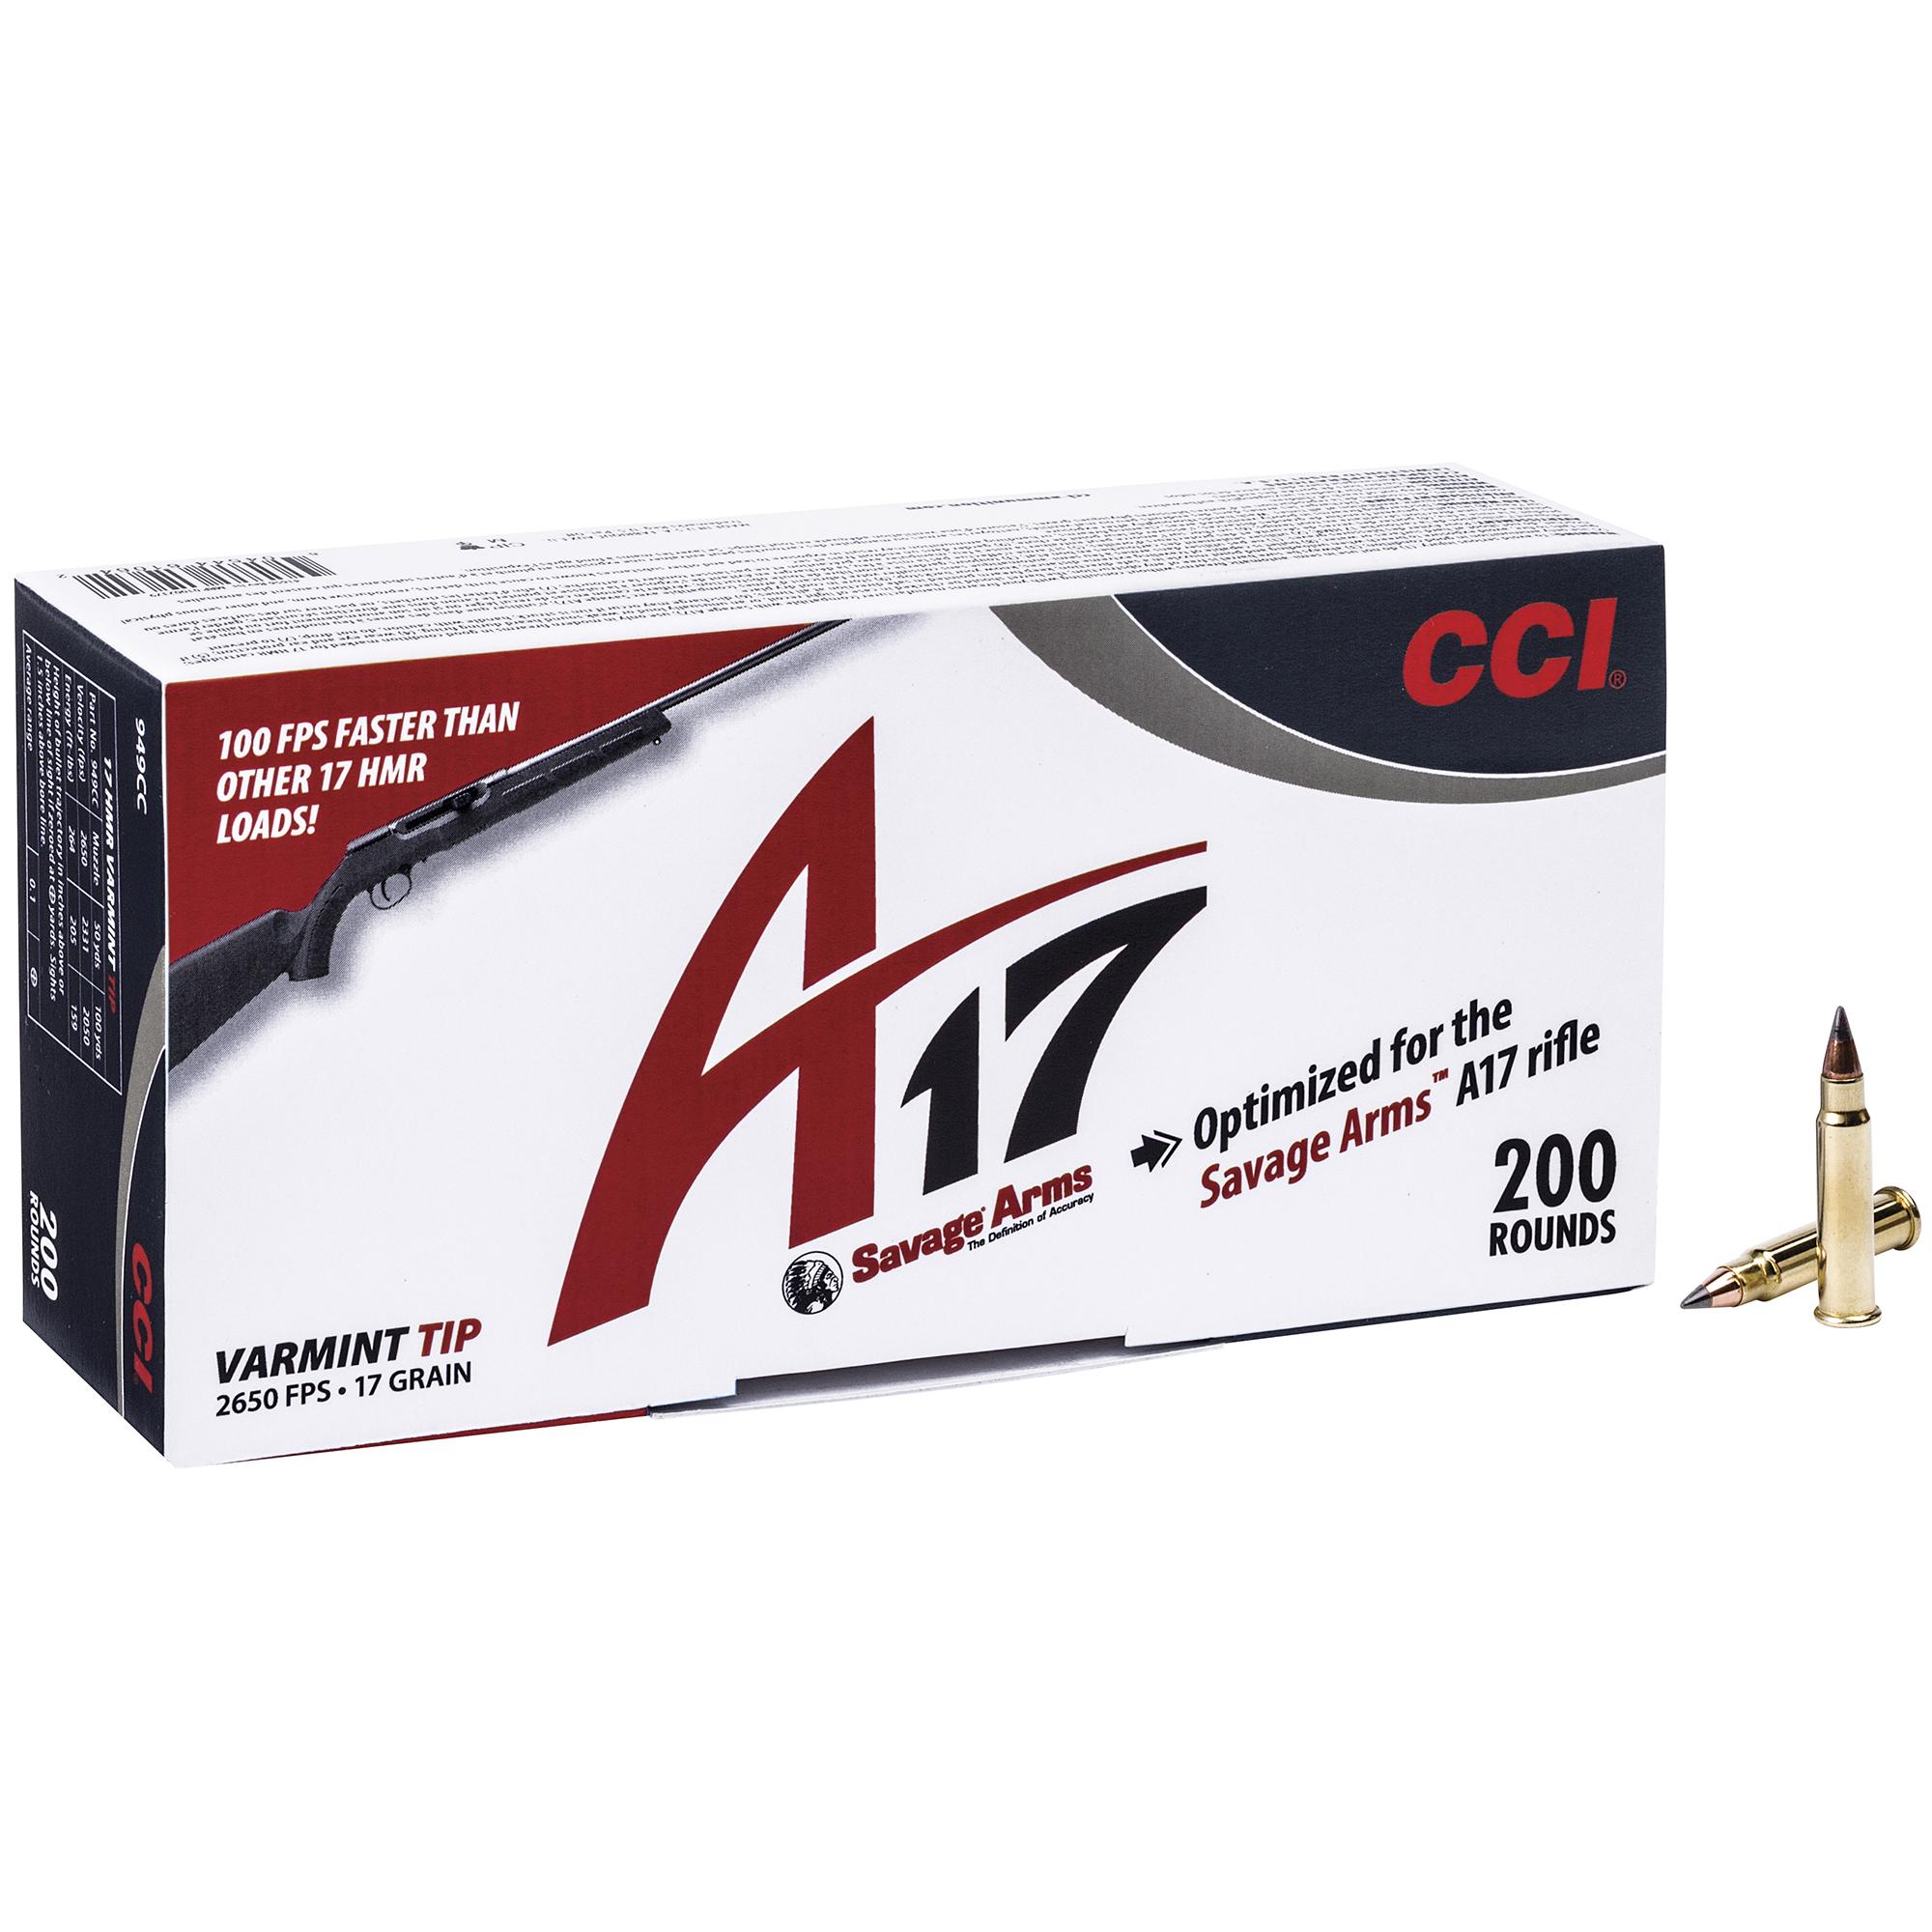 CCI A17 Rimfire Ammo, .17 HMR, 17-gr, VT